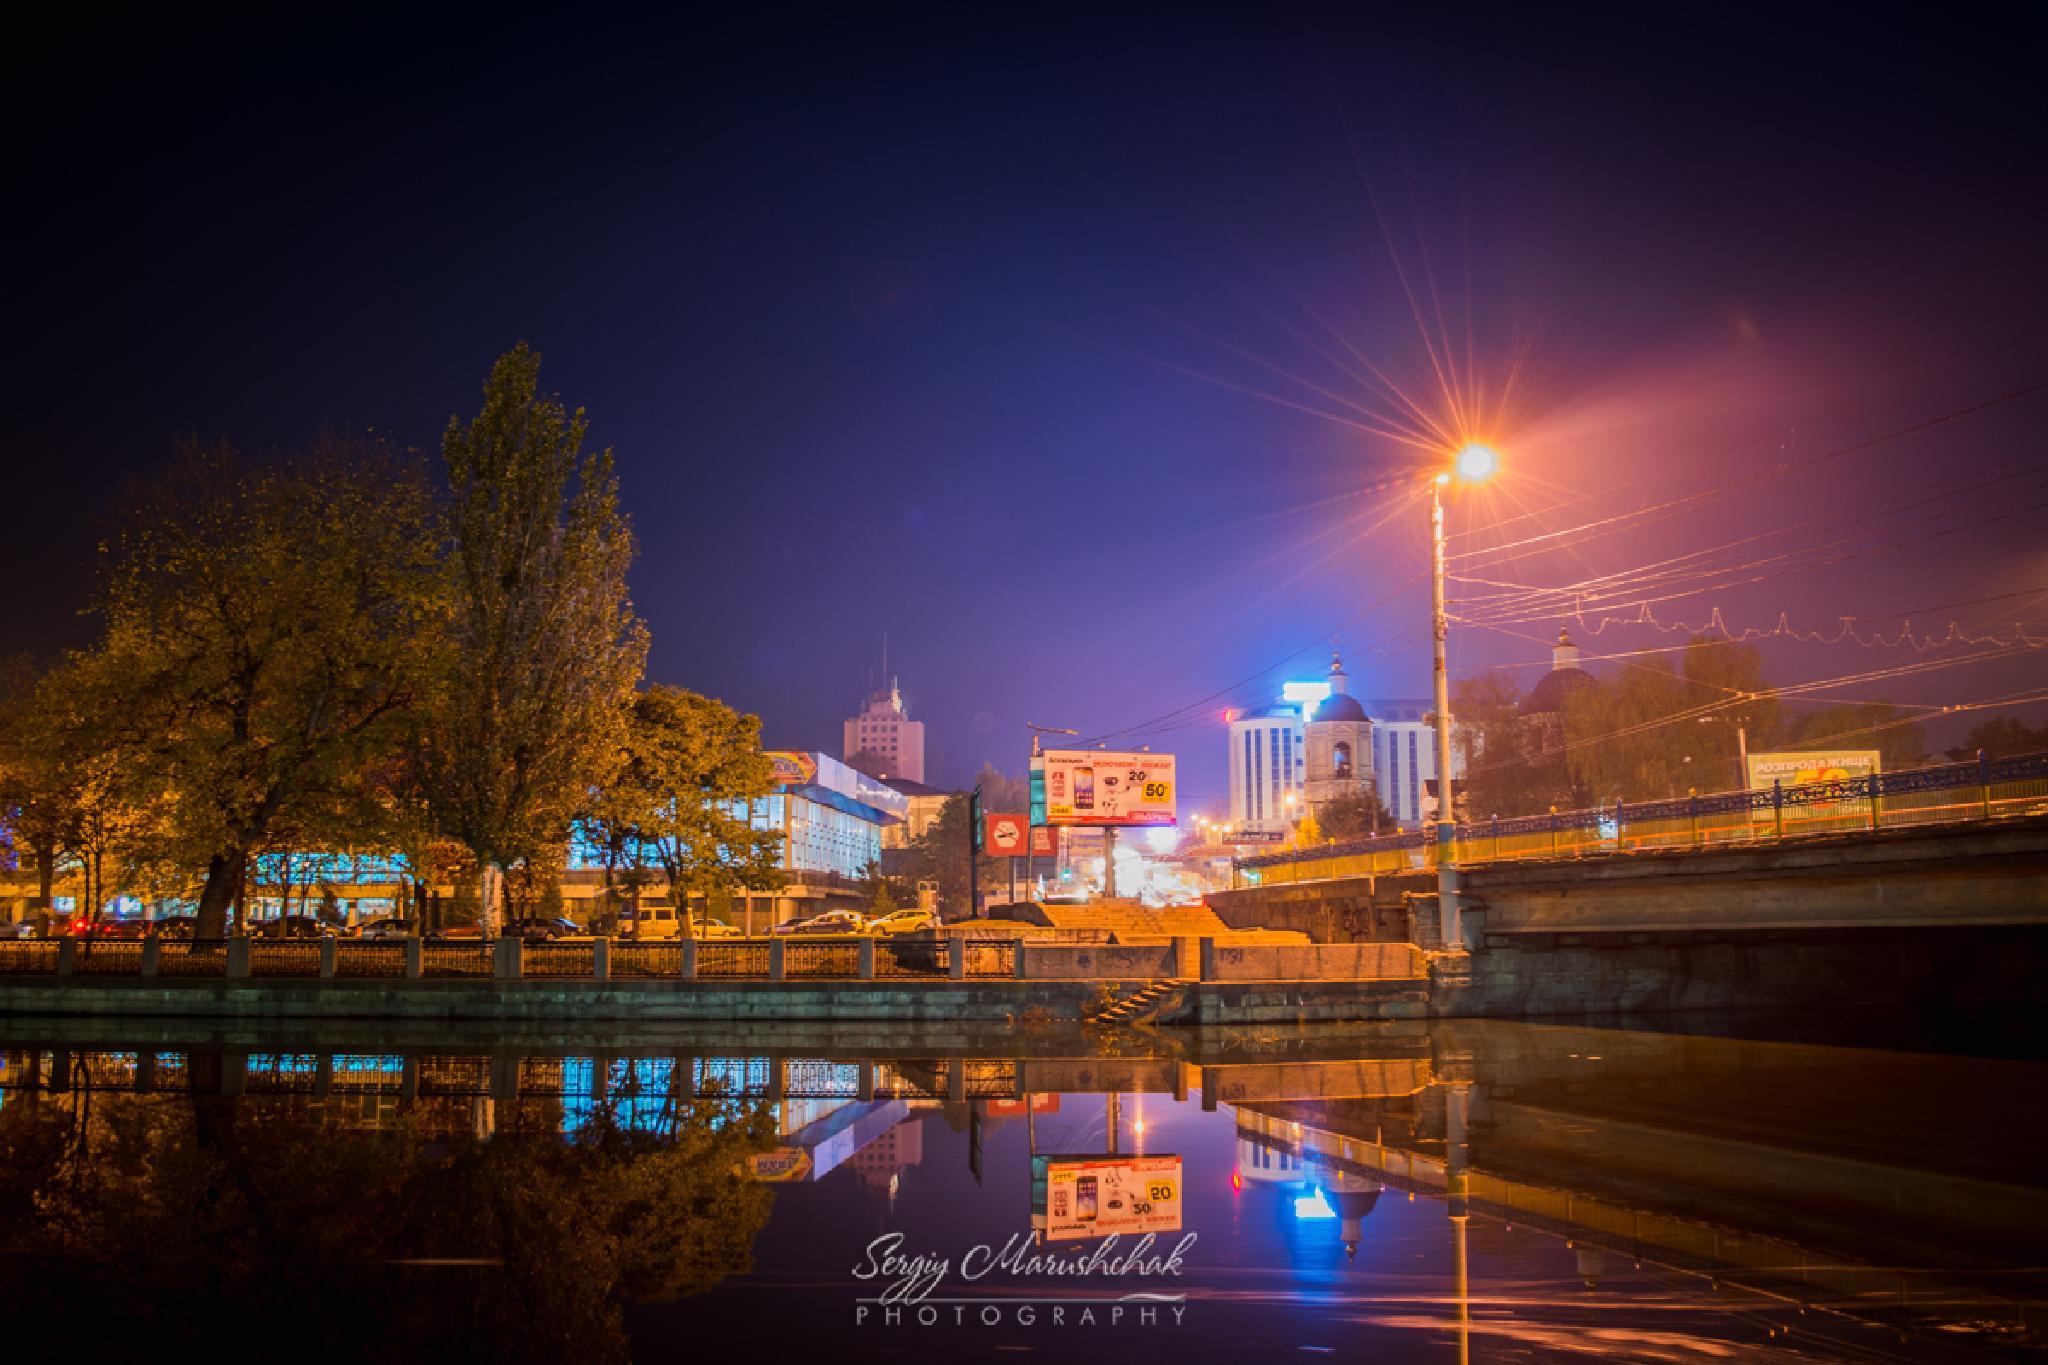 Вечірній краєвид / Evening landscape by artmars07